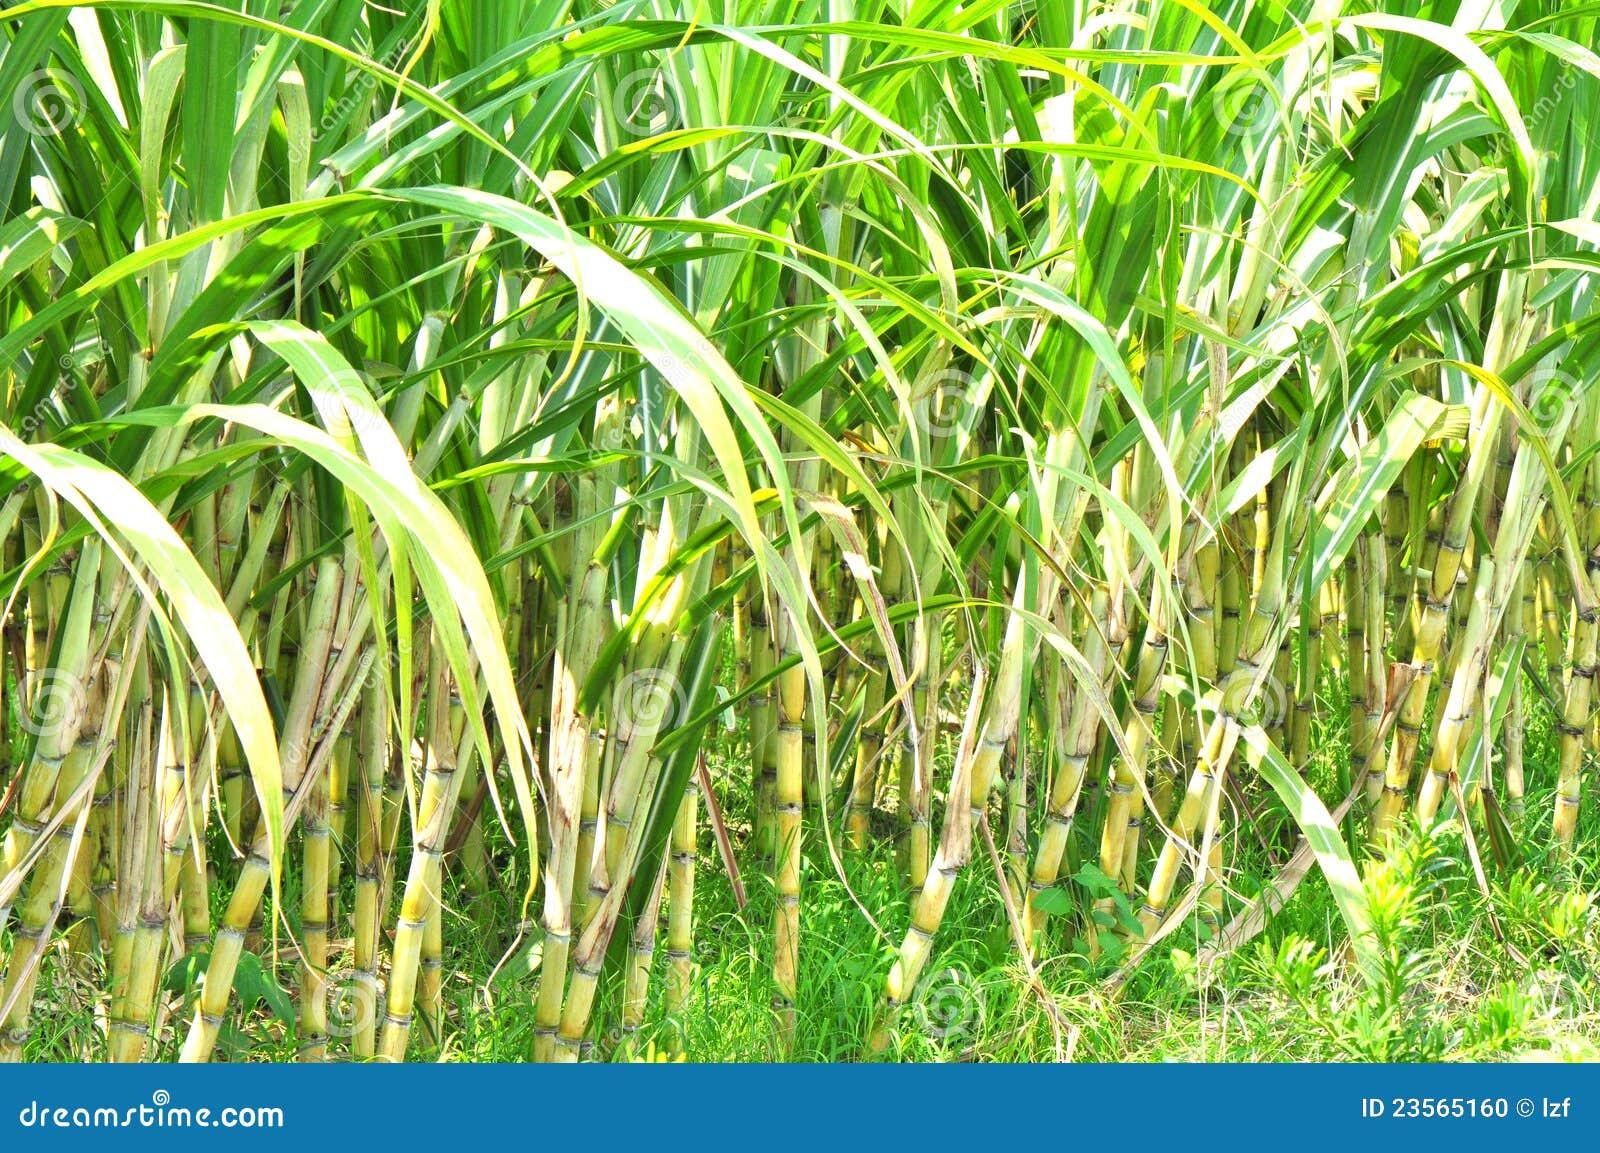 Sugarcane Estate Stock Photo. Image Of Leaves, Farm, Field